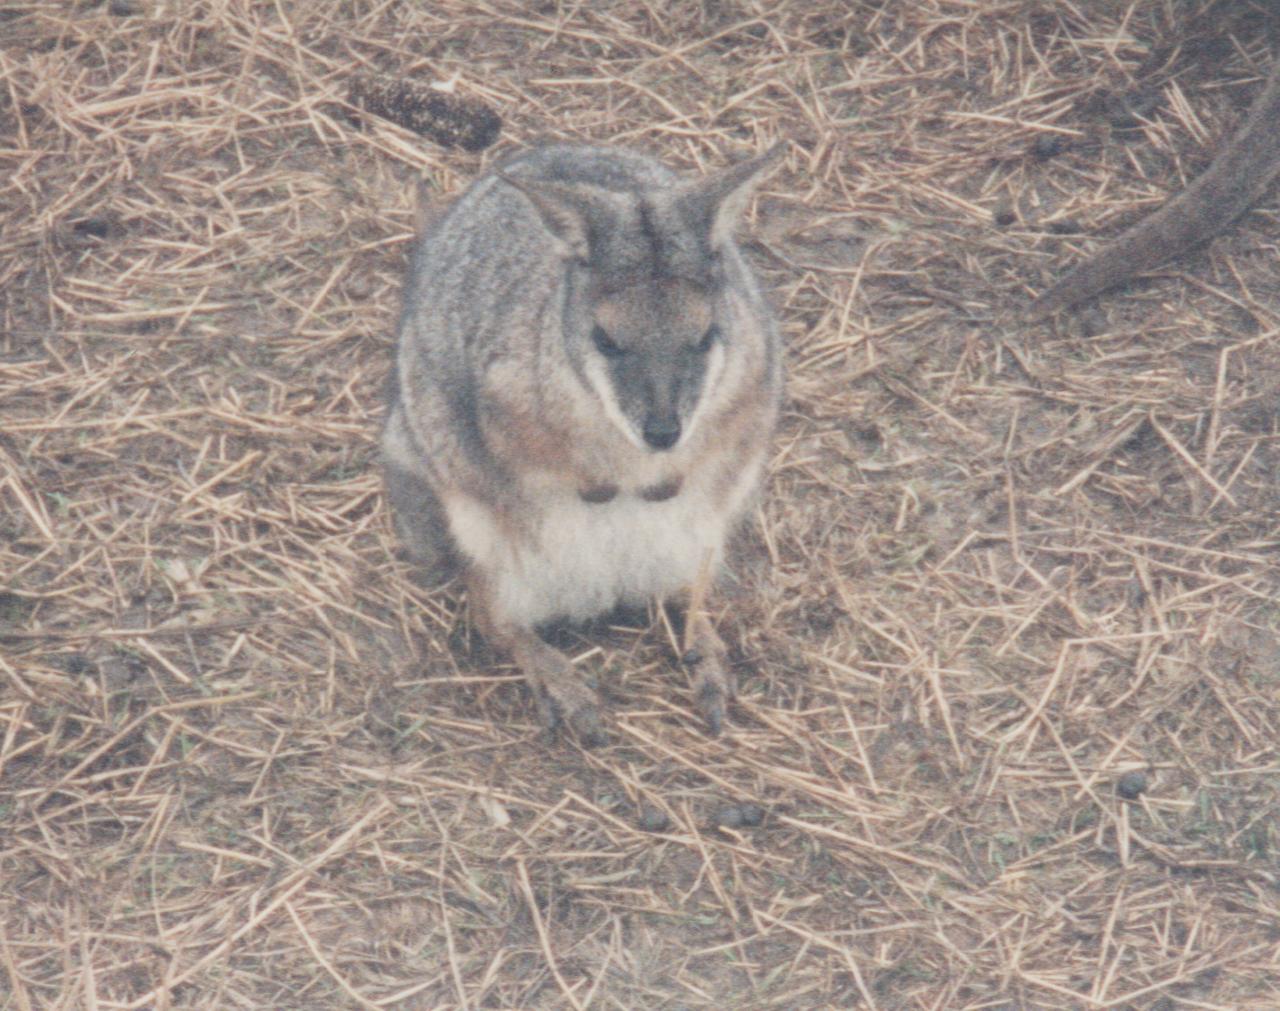 1992-12-26 - Saturday - Wildlife Safari Trip, Marilyn, Crystal-19.png